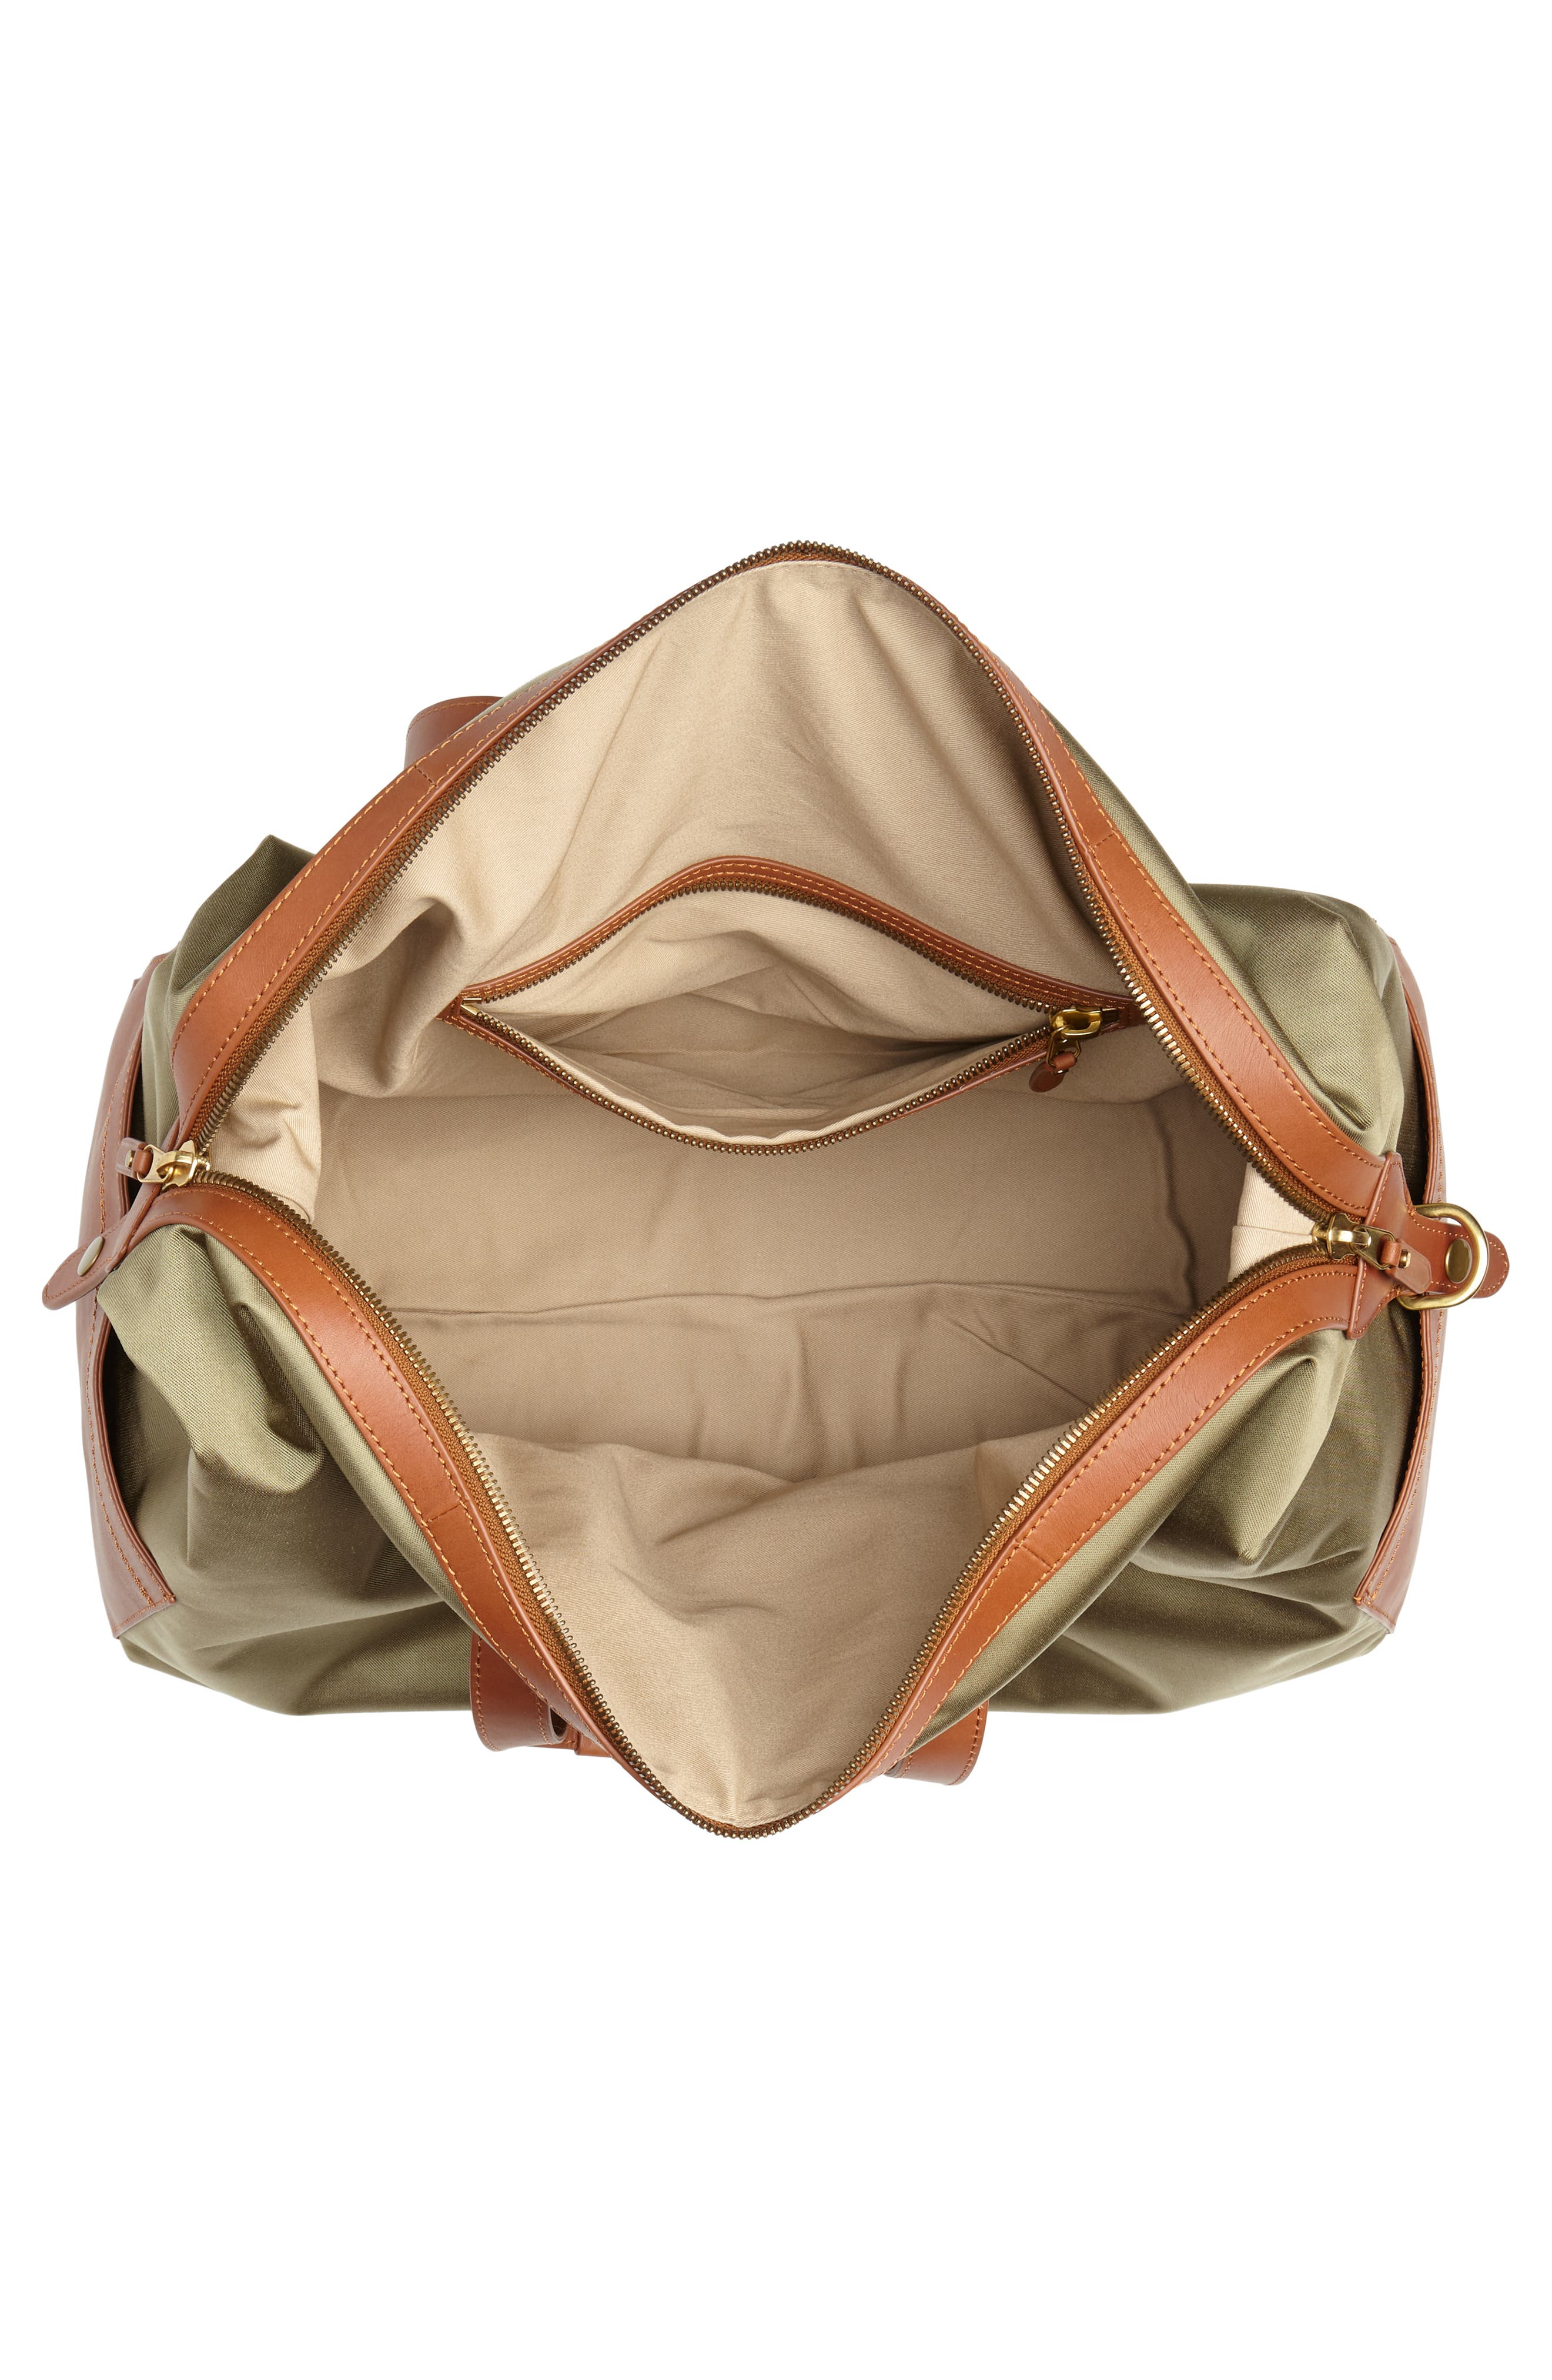 J.CREW,                             Oar Stripe Weekend Bag,                             Alternate thumbnail 4, color,                             300